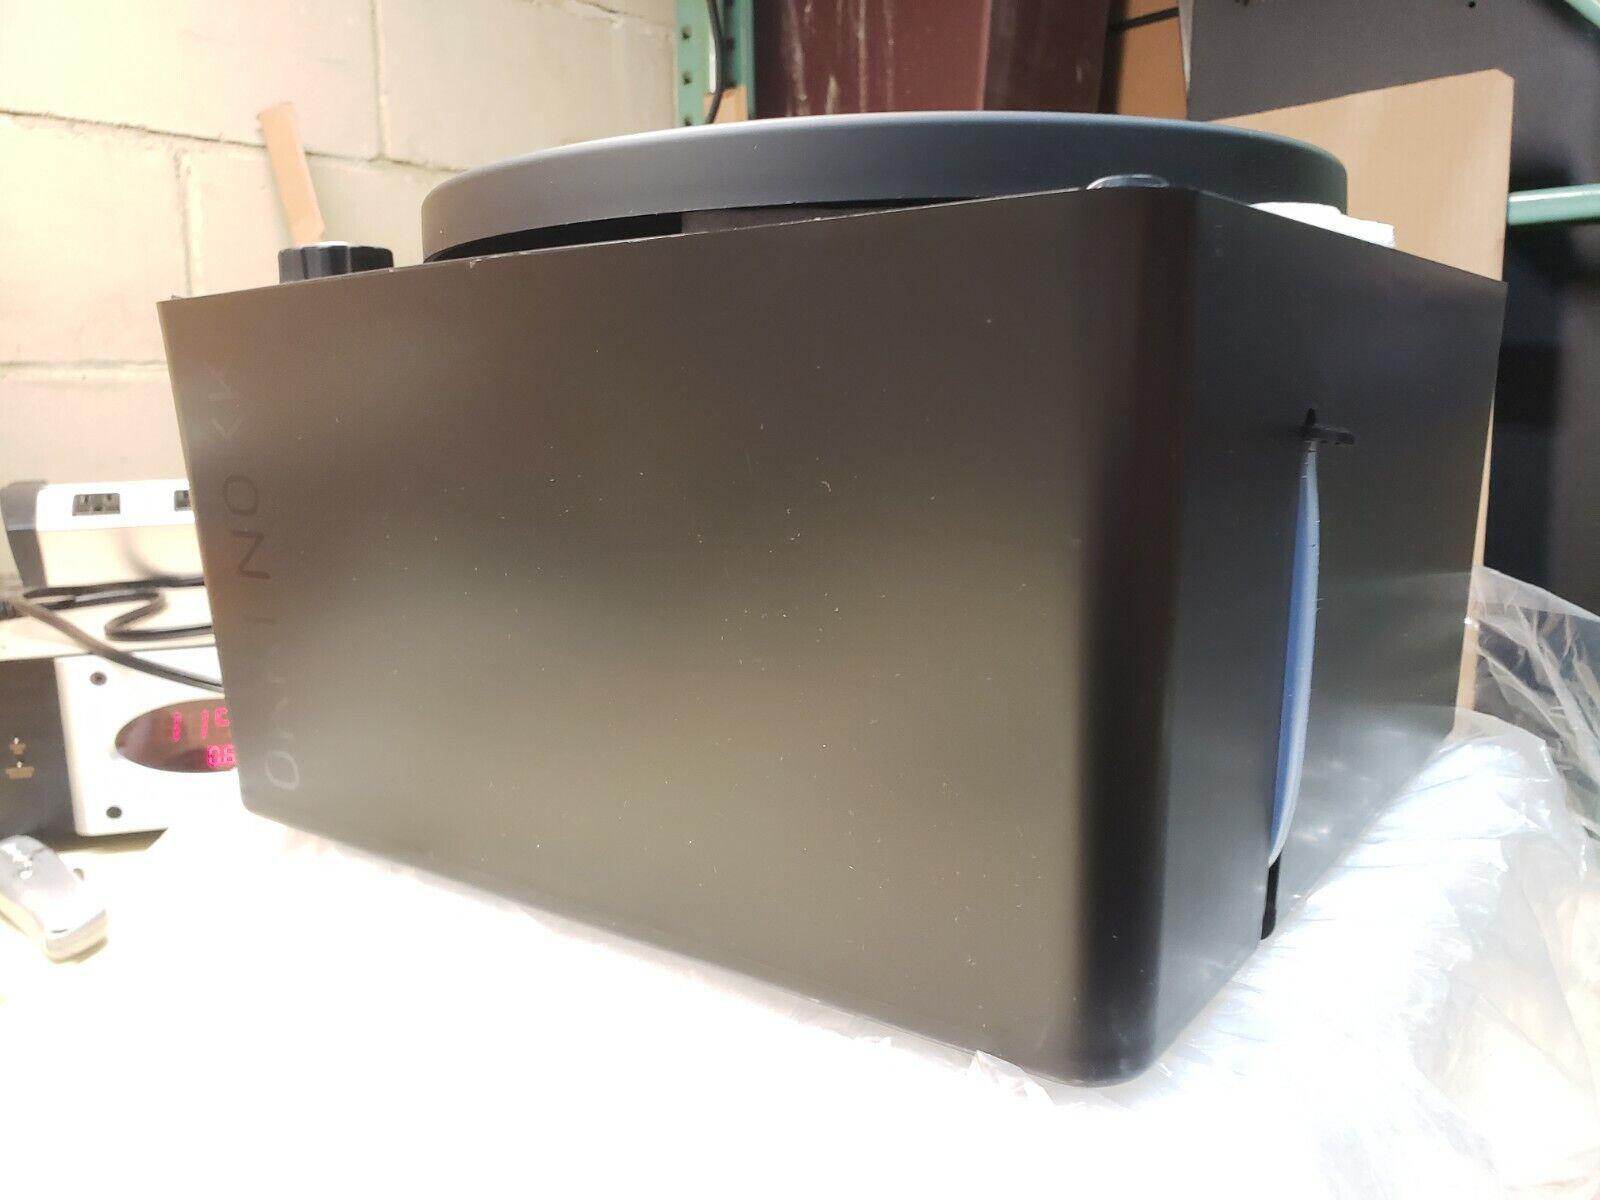 Okki Nokki ONE RCM Vinyl Record Cleaning Machine Extra Cleaning Fluid - $579.00